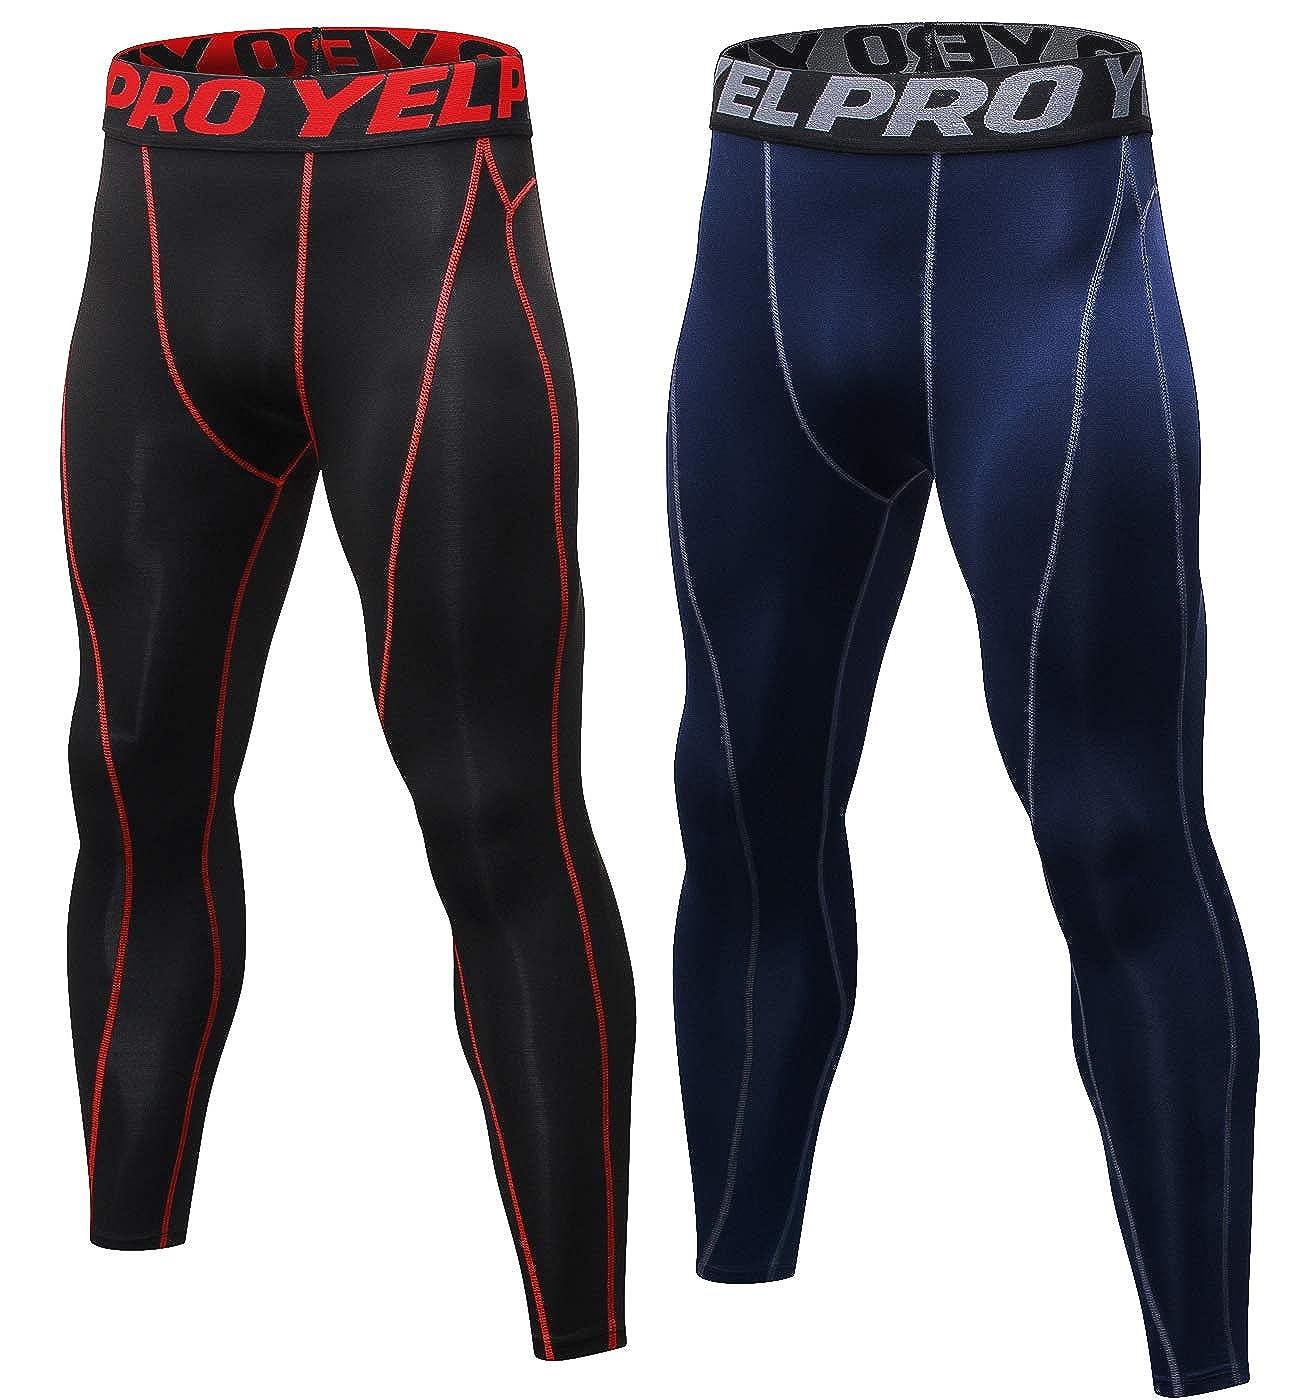 SilkWorld 0723_2 Pack: APPAREL メンズ B07K6FMWB8 XX-Large|0723_2 0723_2 Pack: Black(red Stripe), Navy Blue XX-Large XX-Large|0723_2 Pack: Black(red Stripe), Navy Blue, 南富良野町:a5a6ea0b --- m2cweb.com